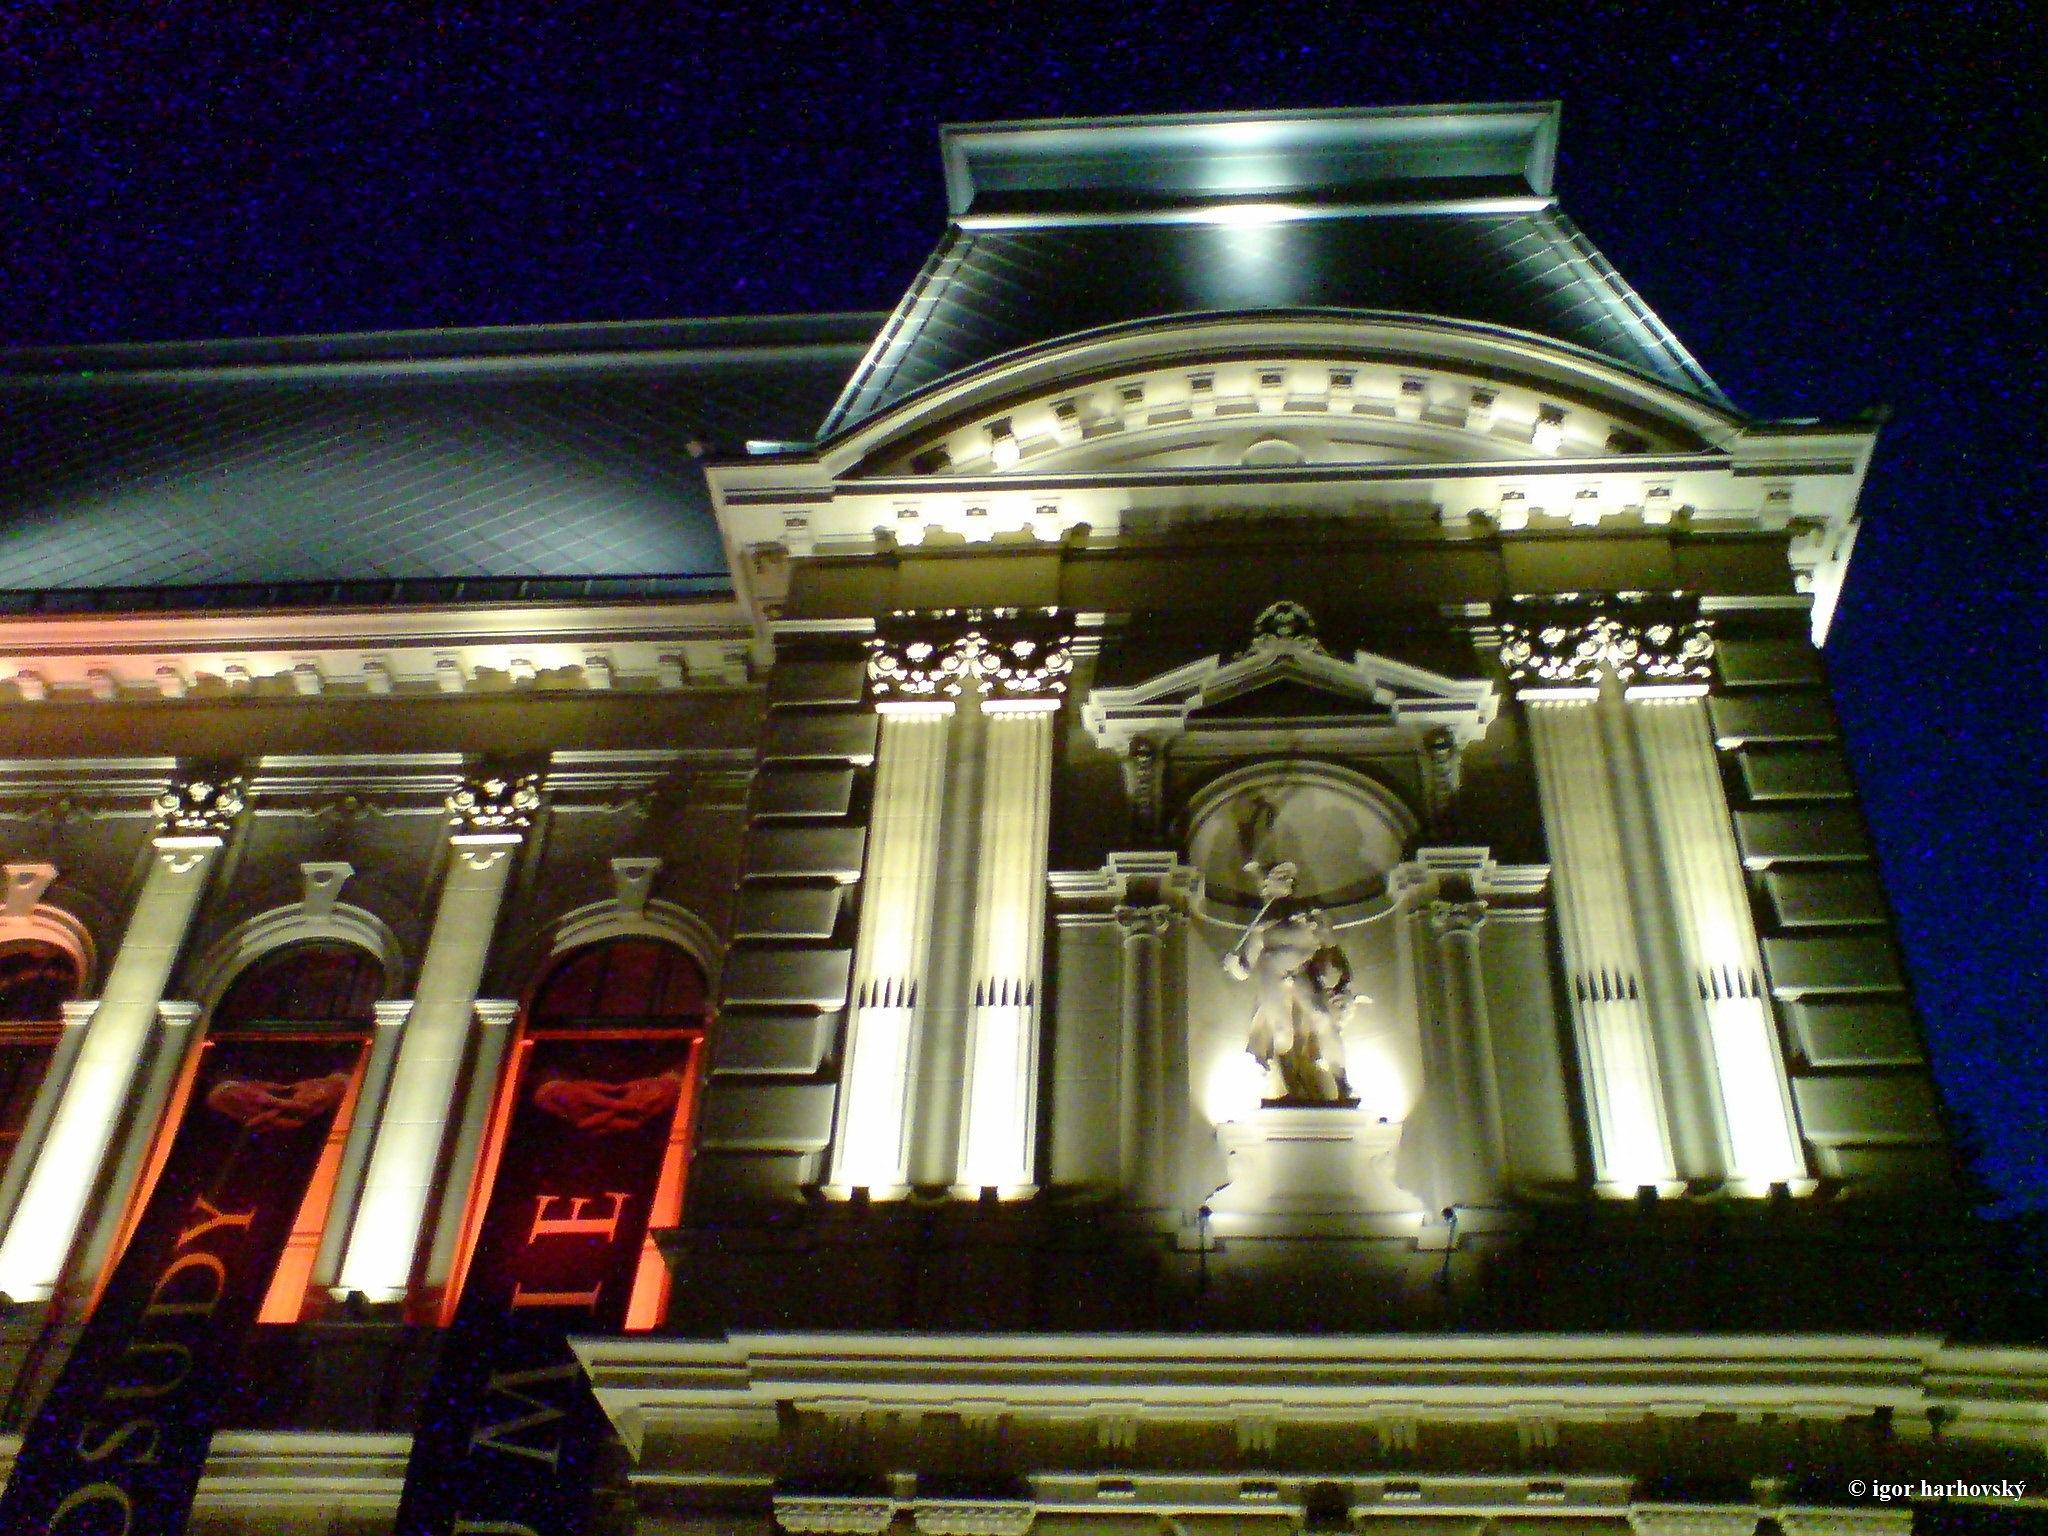 museum by igor.harhovsky